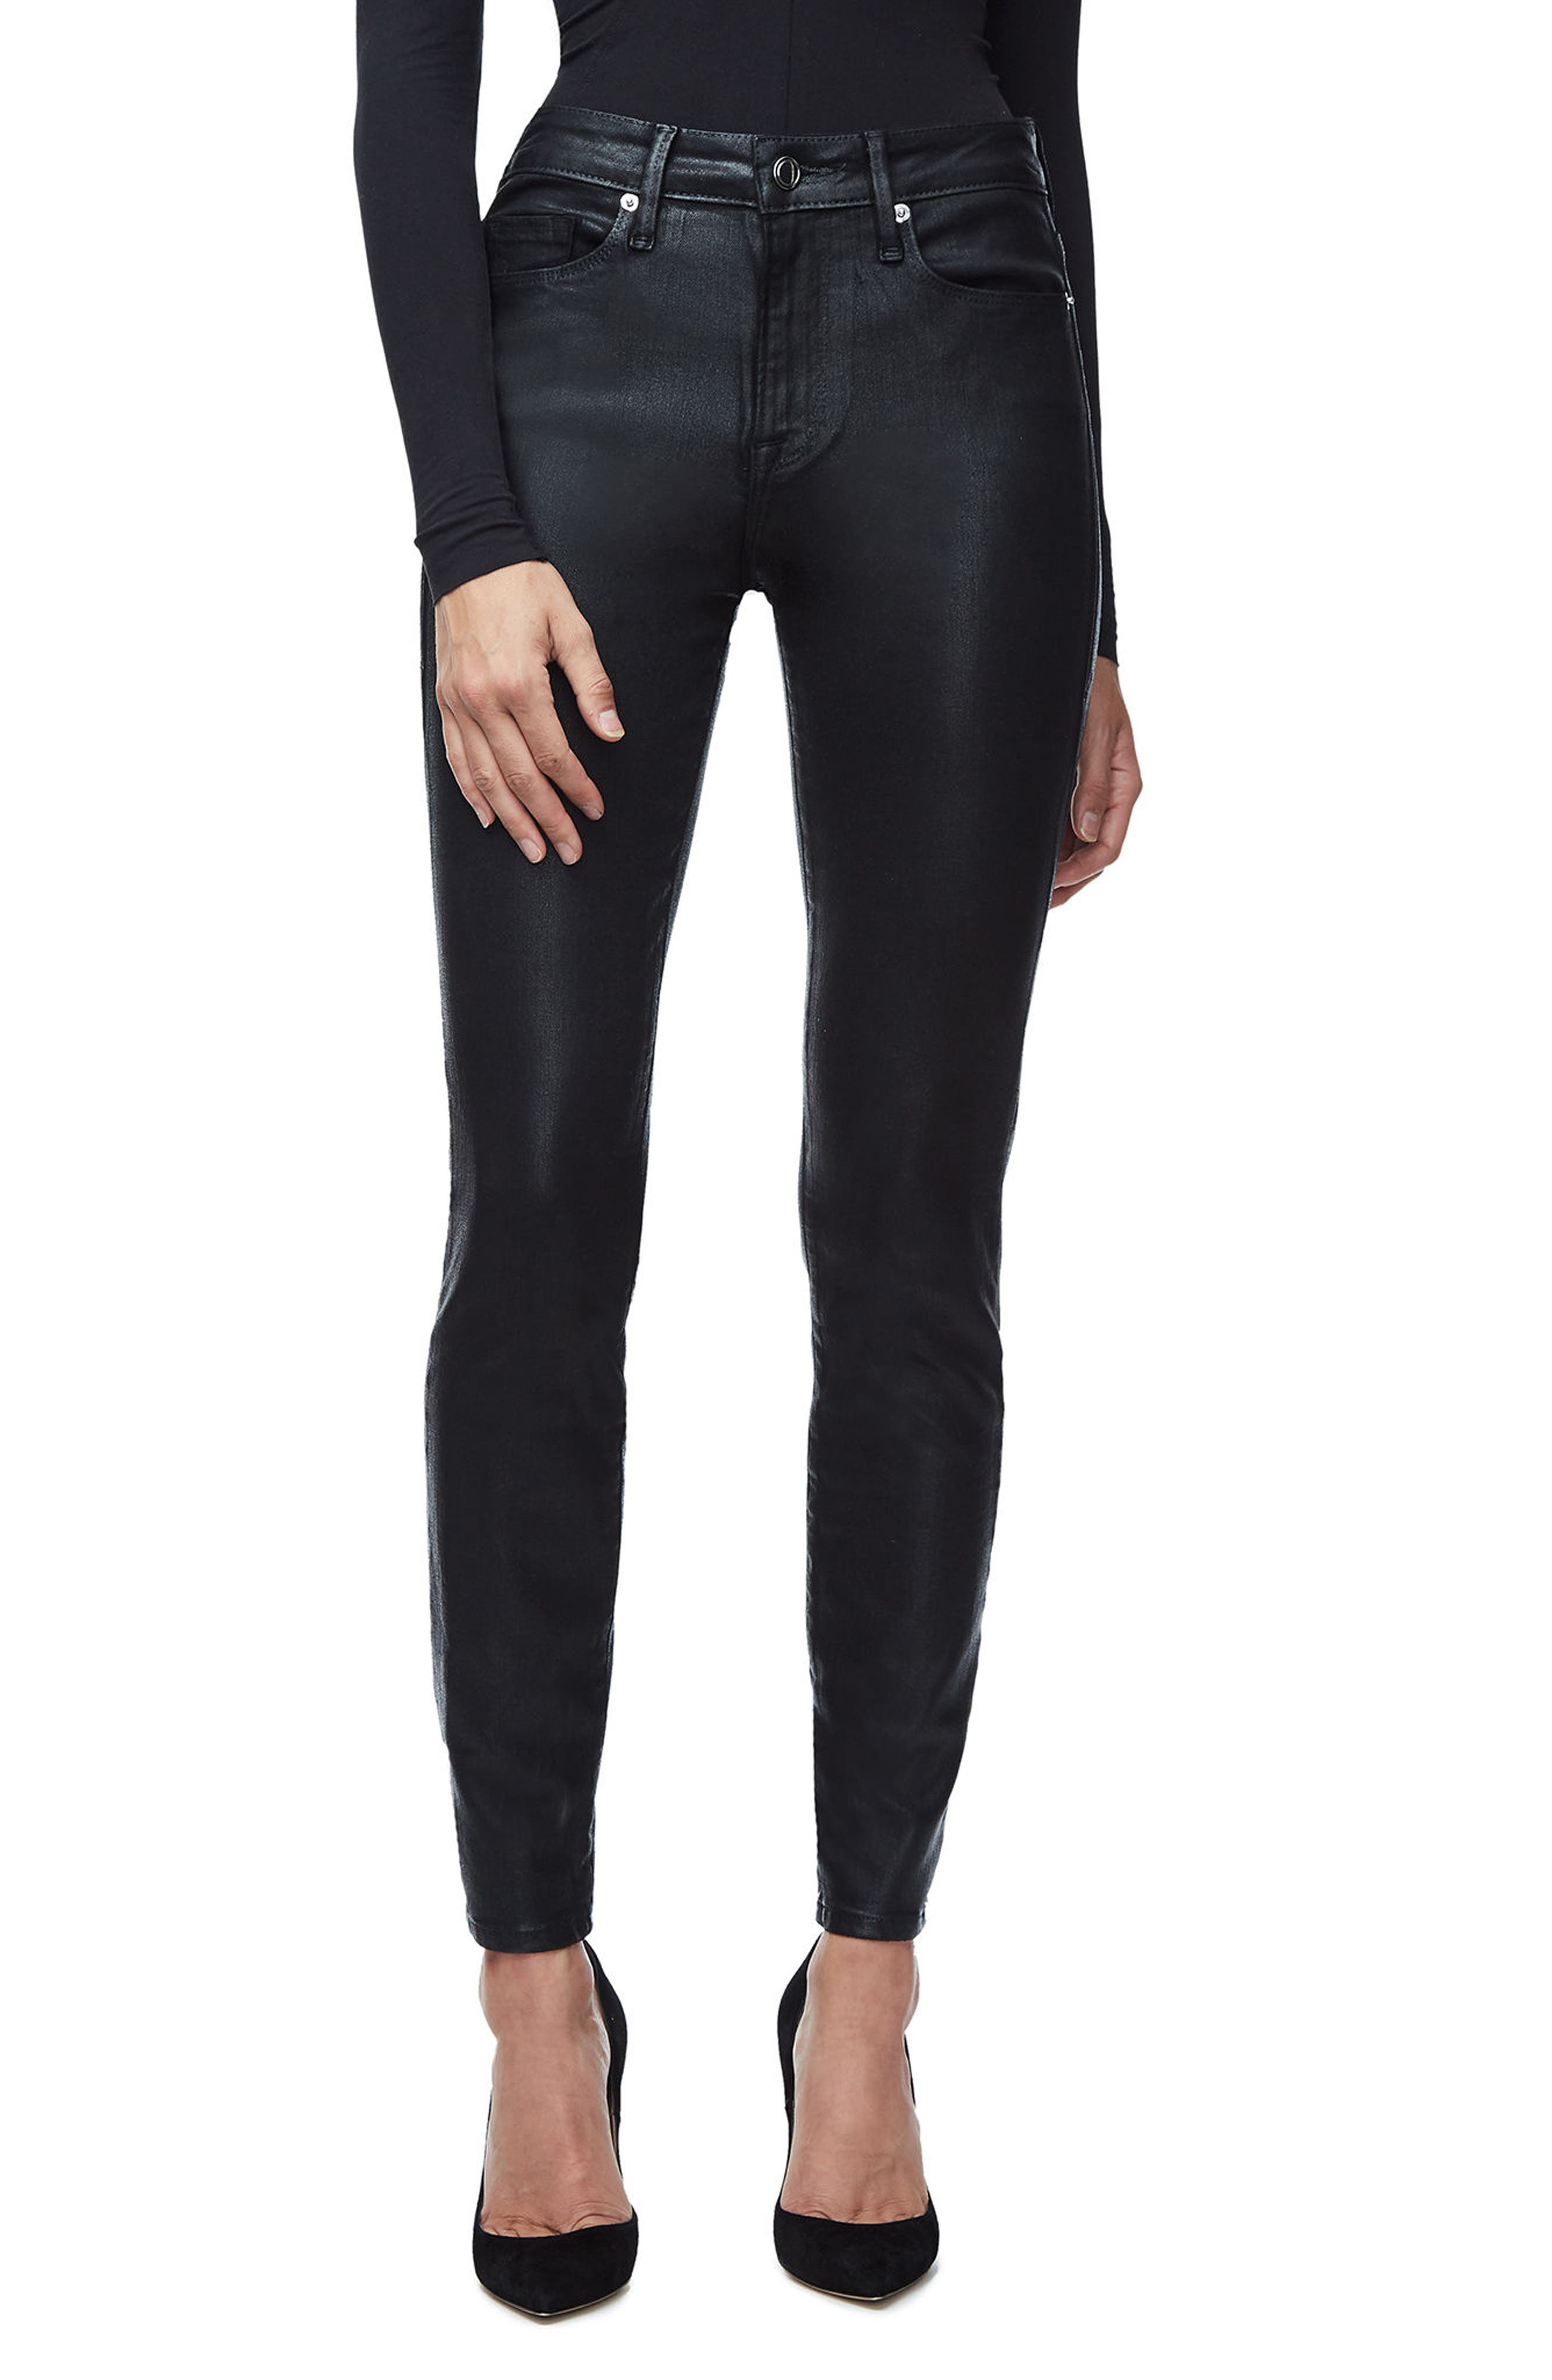 GOOD AMERICAN, Good Legs High Waist Skinny Jeans, Main thumbnail 1, color, BLACK